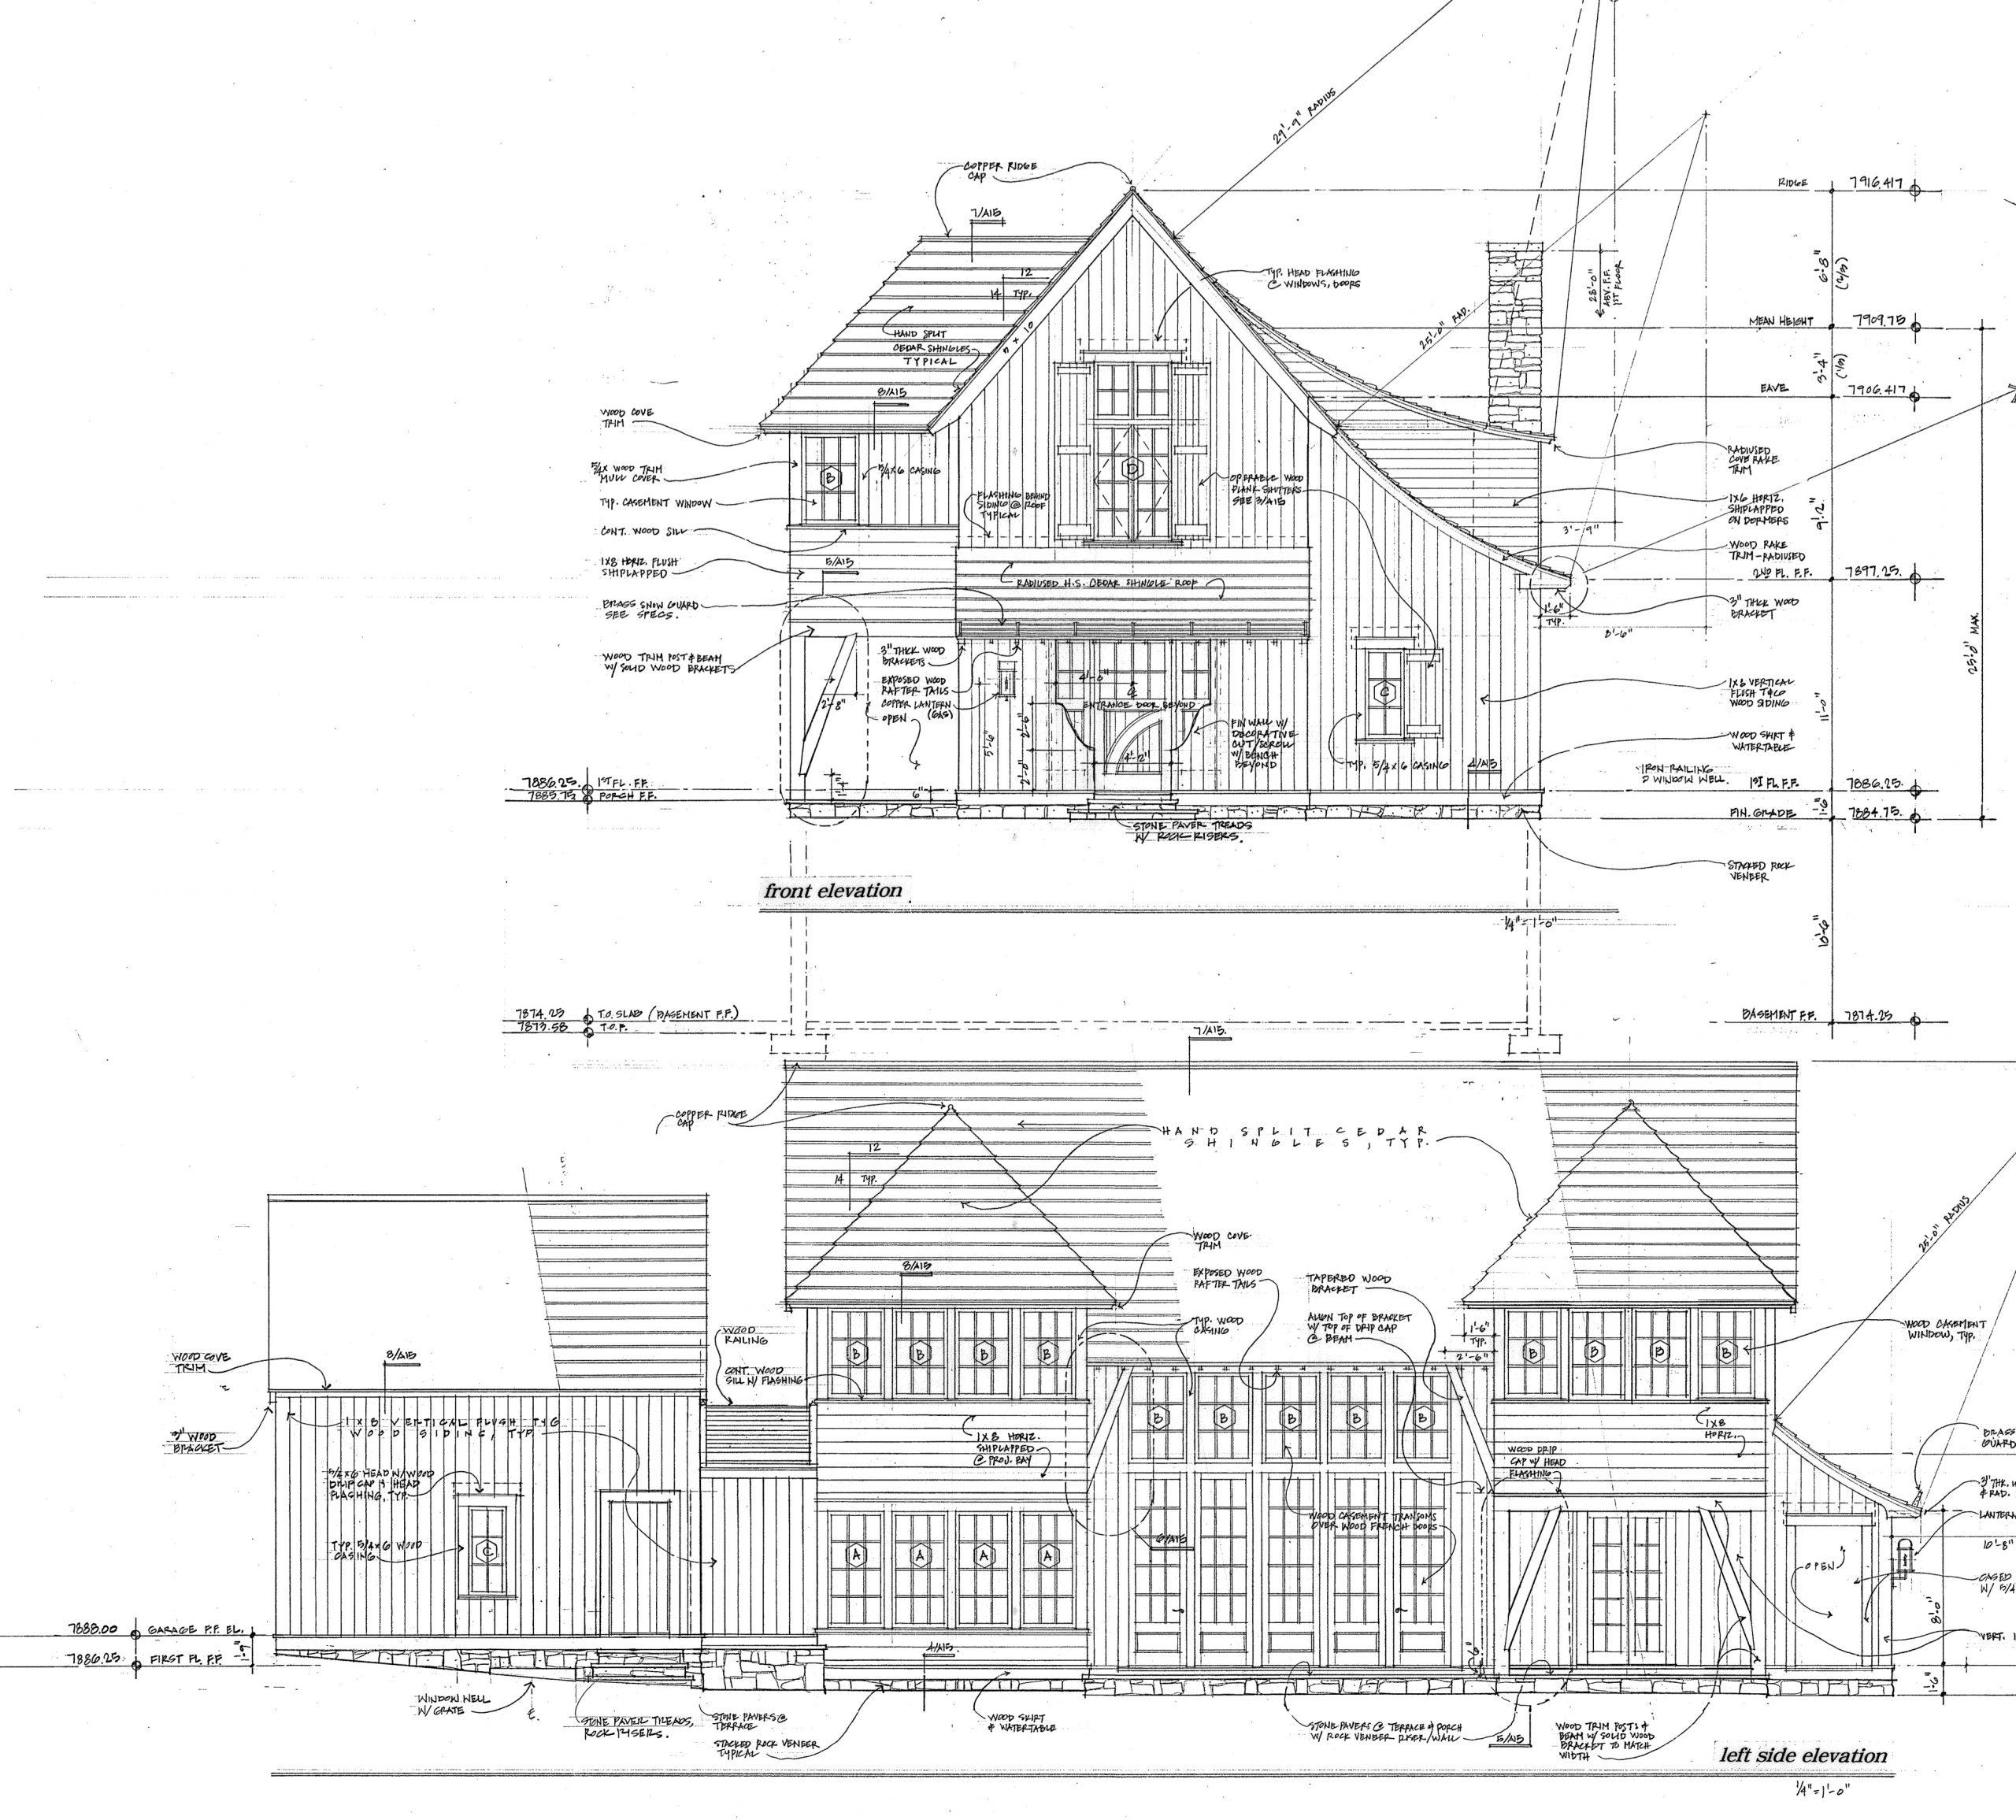 McAlpine Journal: Architectural Process